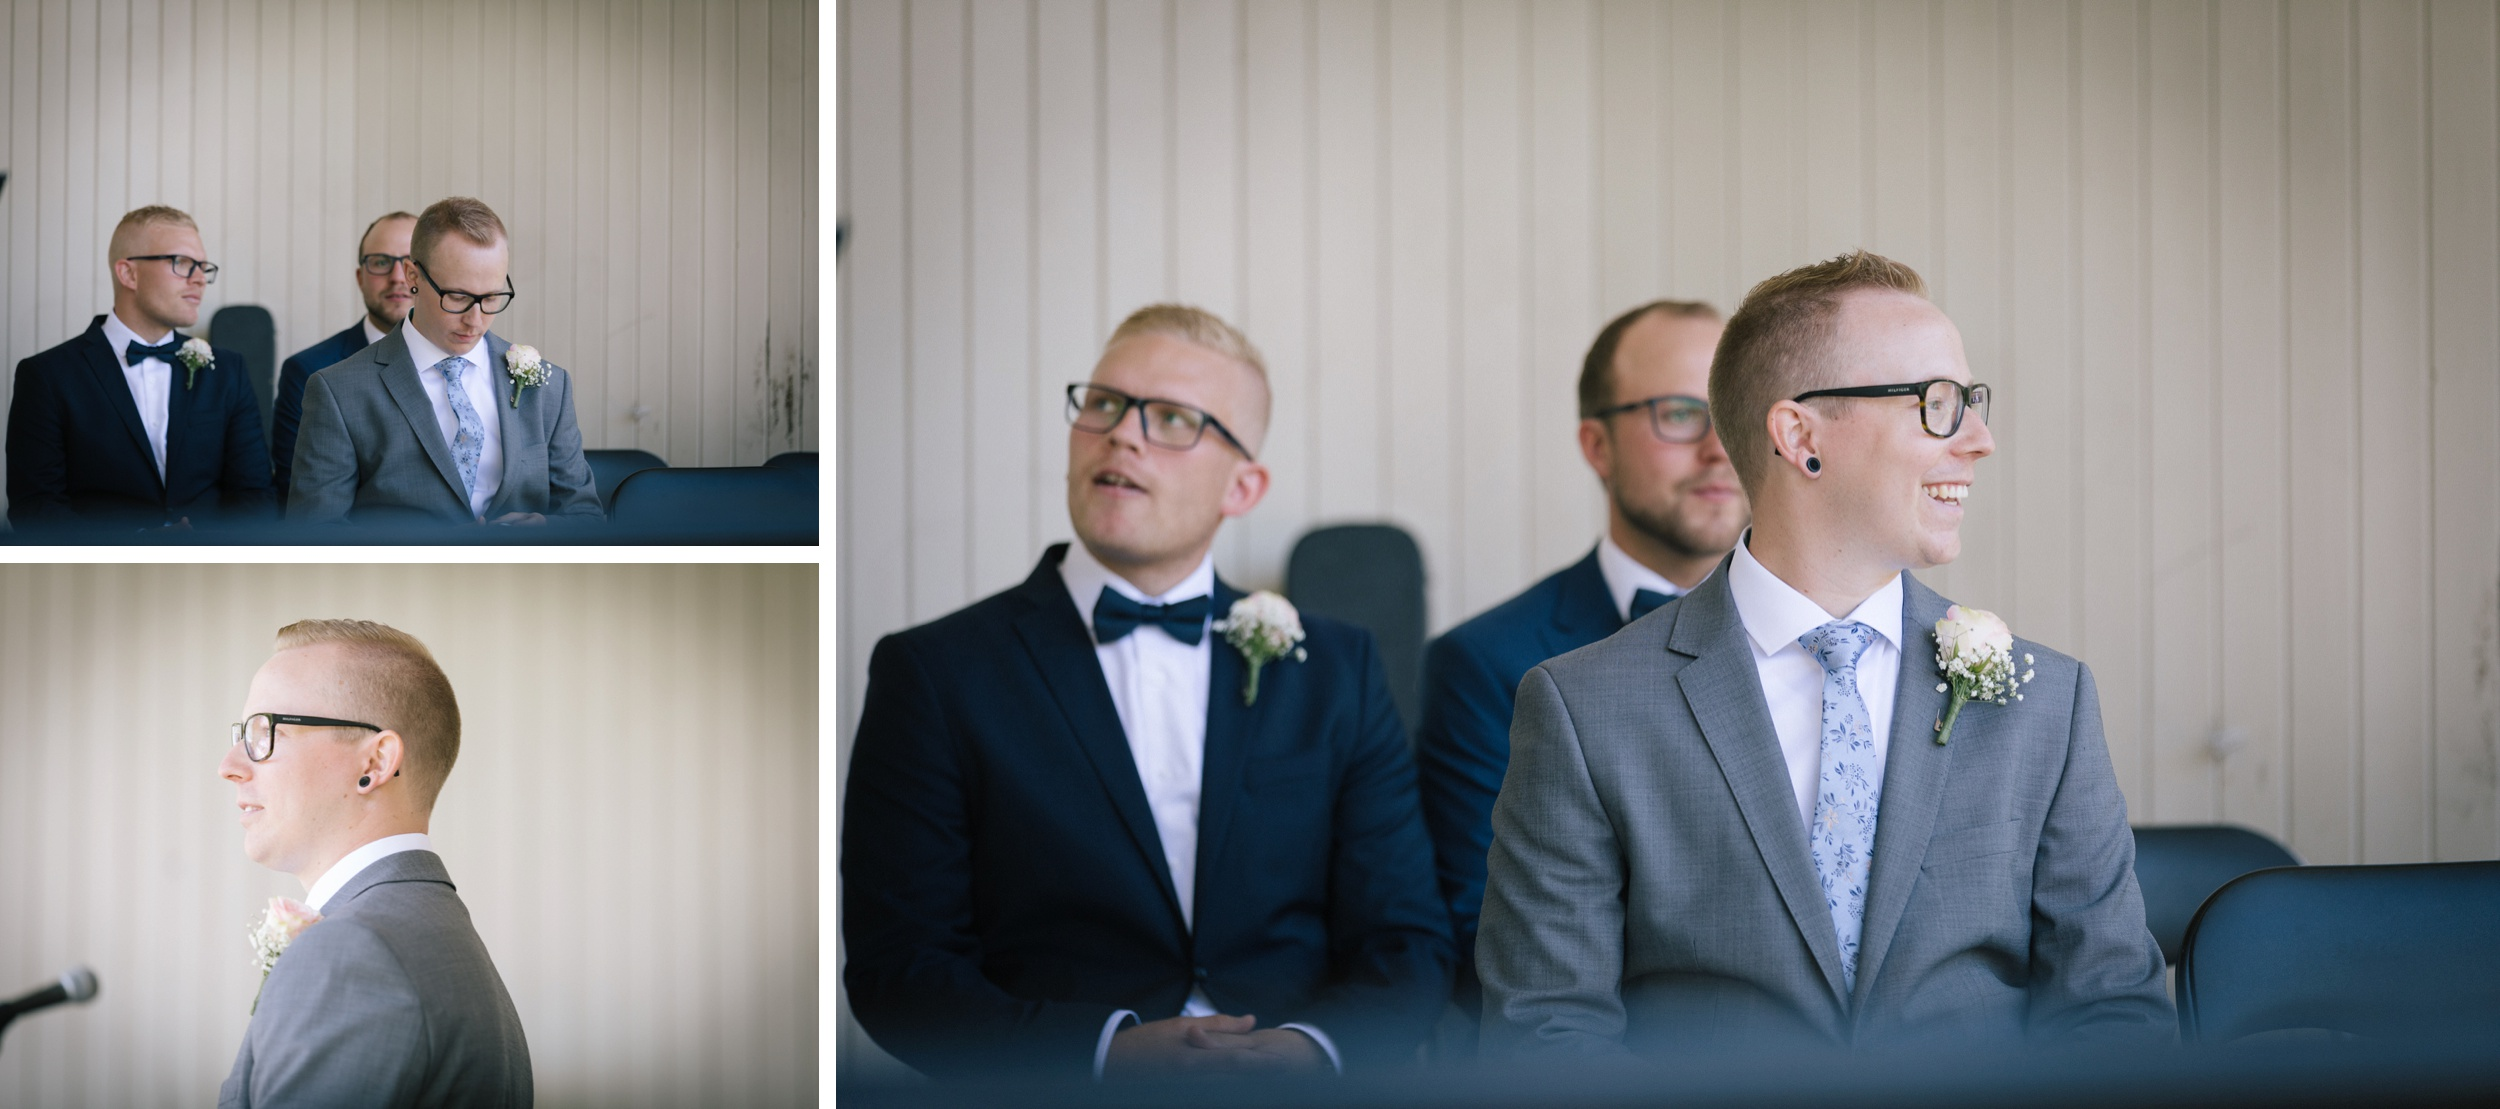 bryllup-bryllupsfotografering-bryllupsfotograf-sarpsborg-20170617-_H2A1818anneli_phillip_WEB.jpg